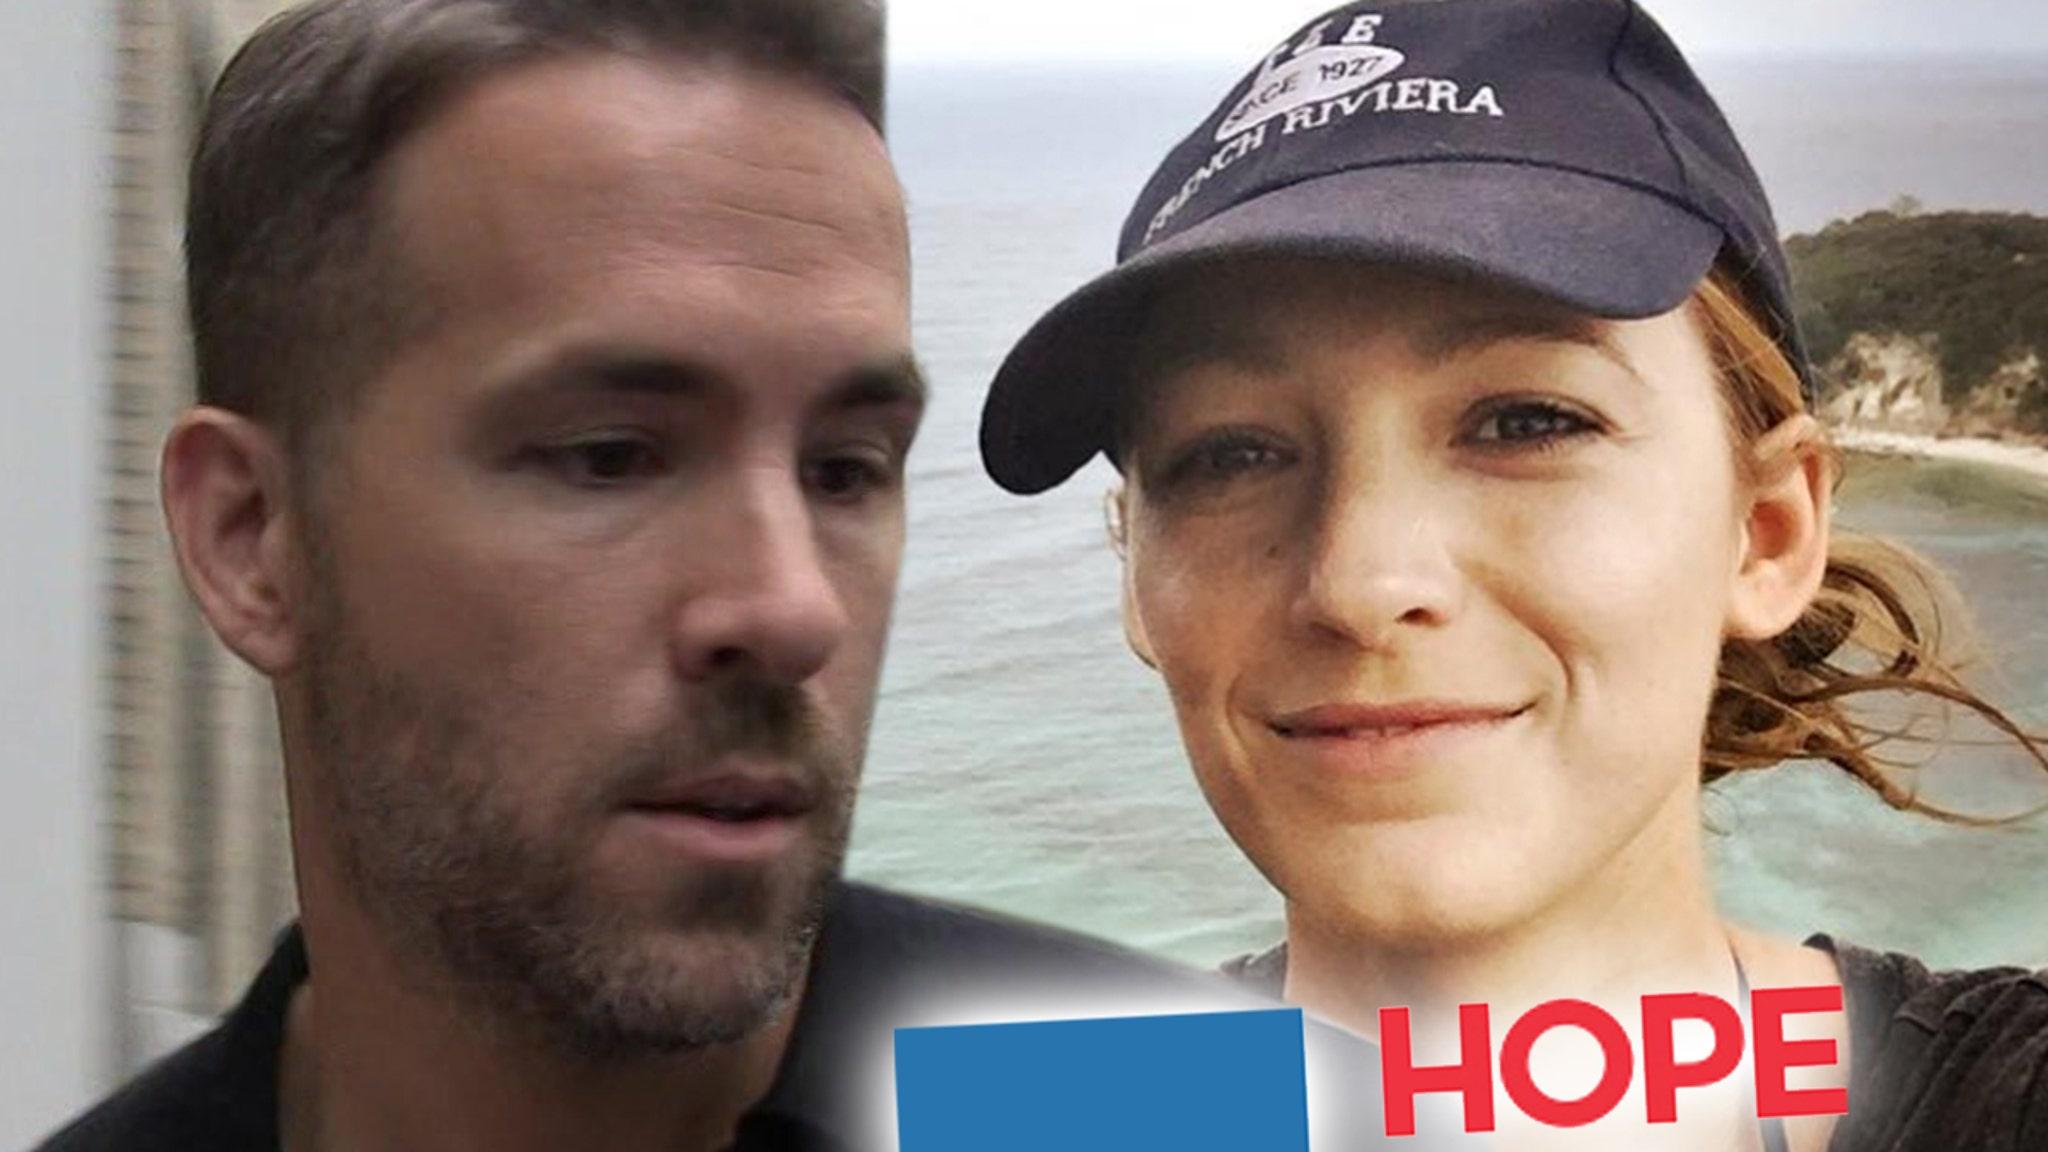 Ryan Reynolds & Blake Lively Donate $10k to Hope for Haiti Quake Relief thumbnail